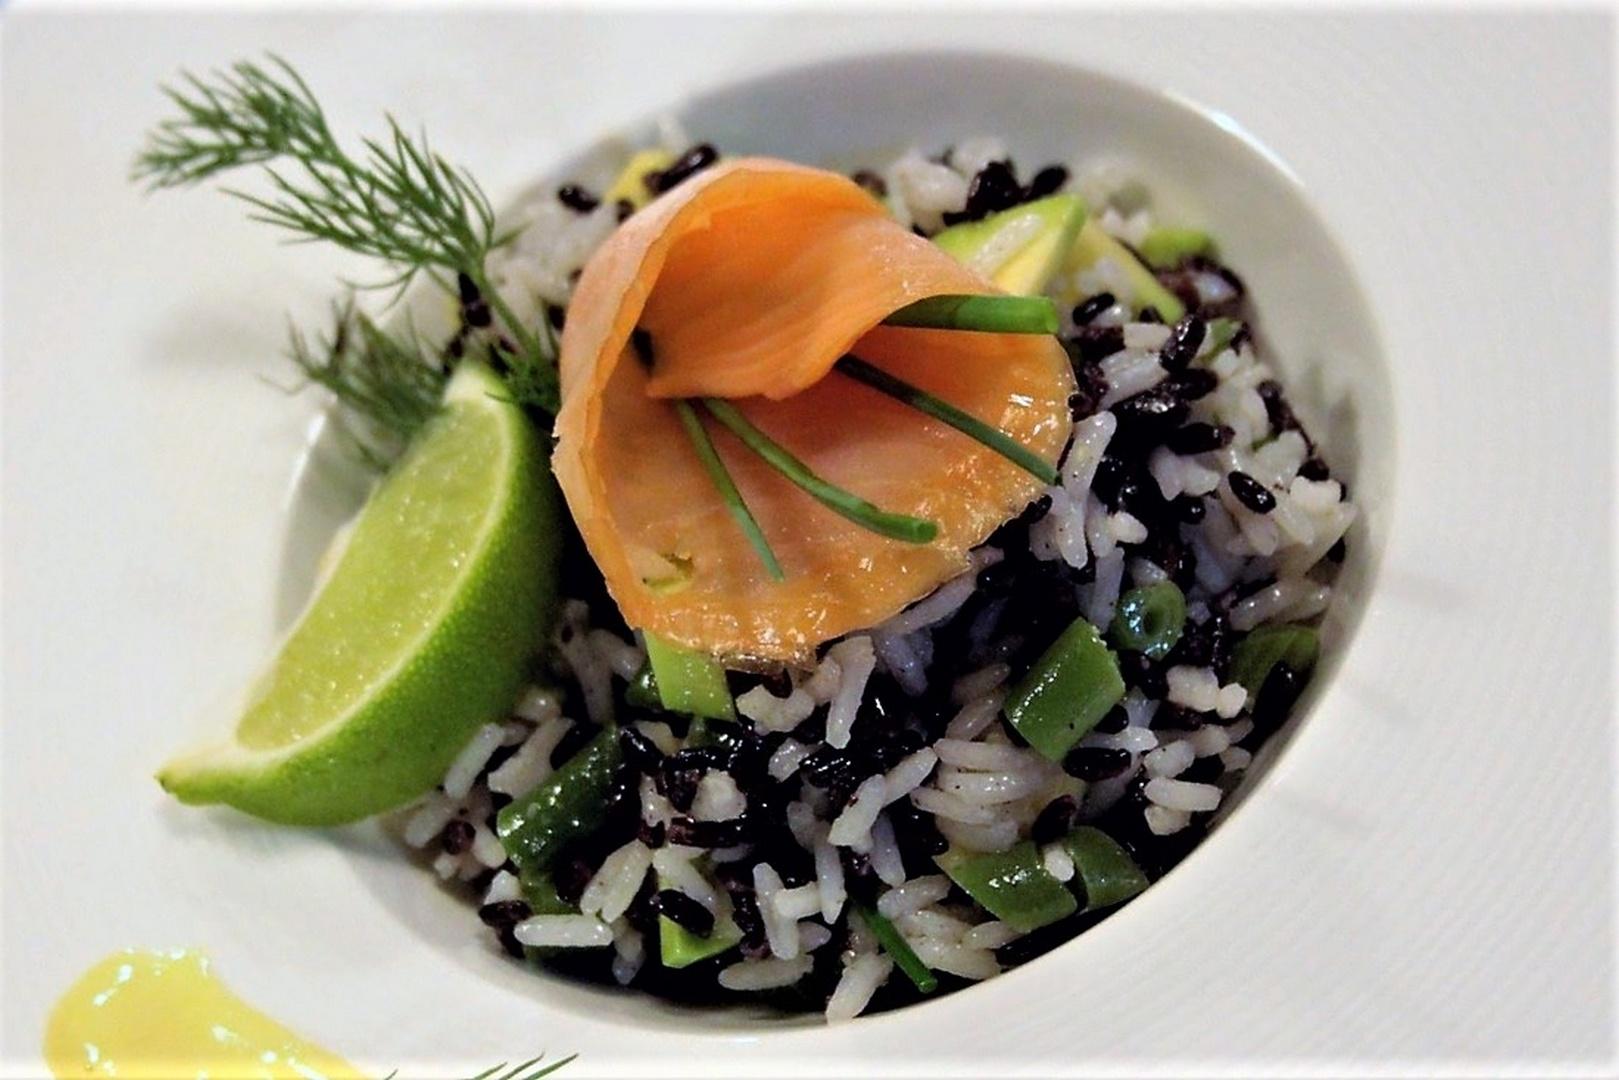 corso di cucina senza glutine a torino in collaborazione con aic piemonte cucina senza glutine gluten free